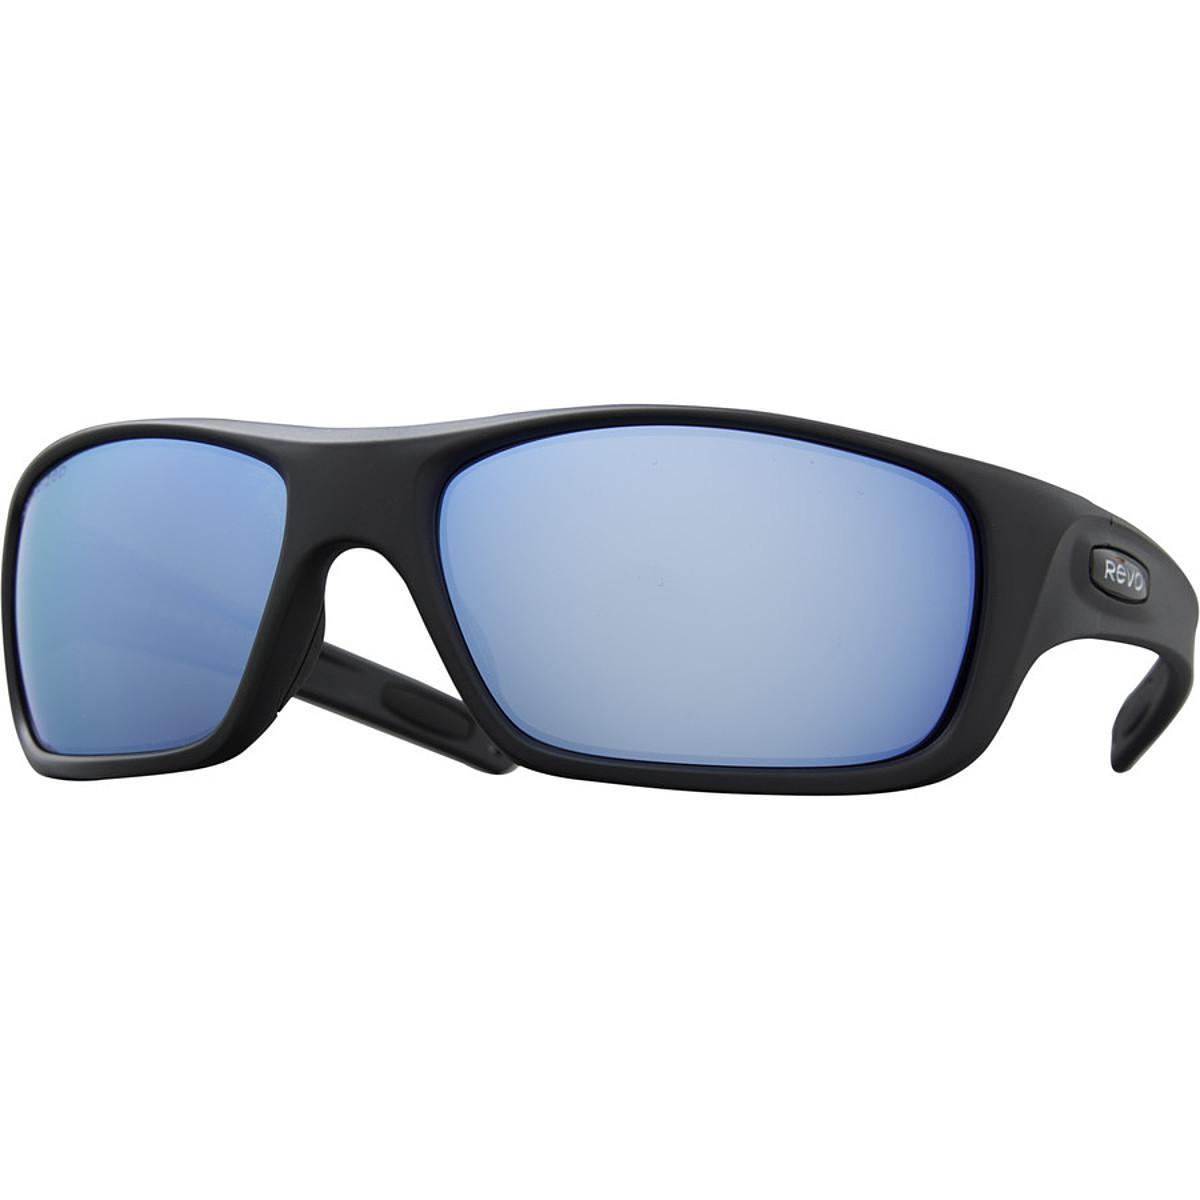 aec3aca1adf Lyst - Revo Guide Ii Sunglasses - Polarized in Blue for Men